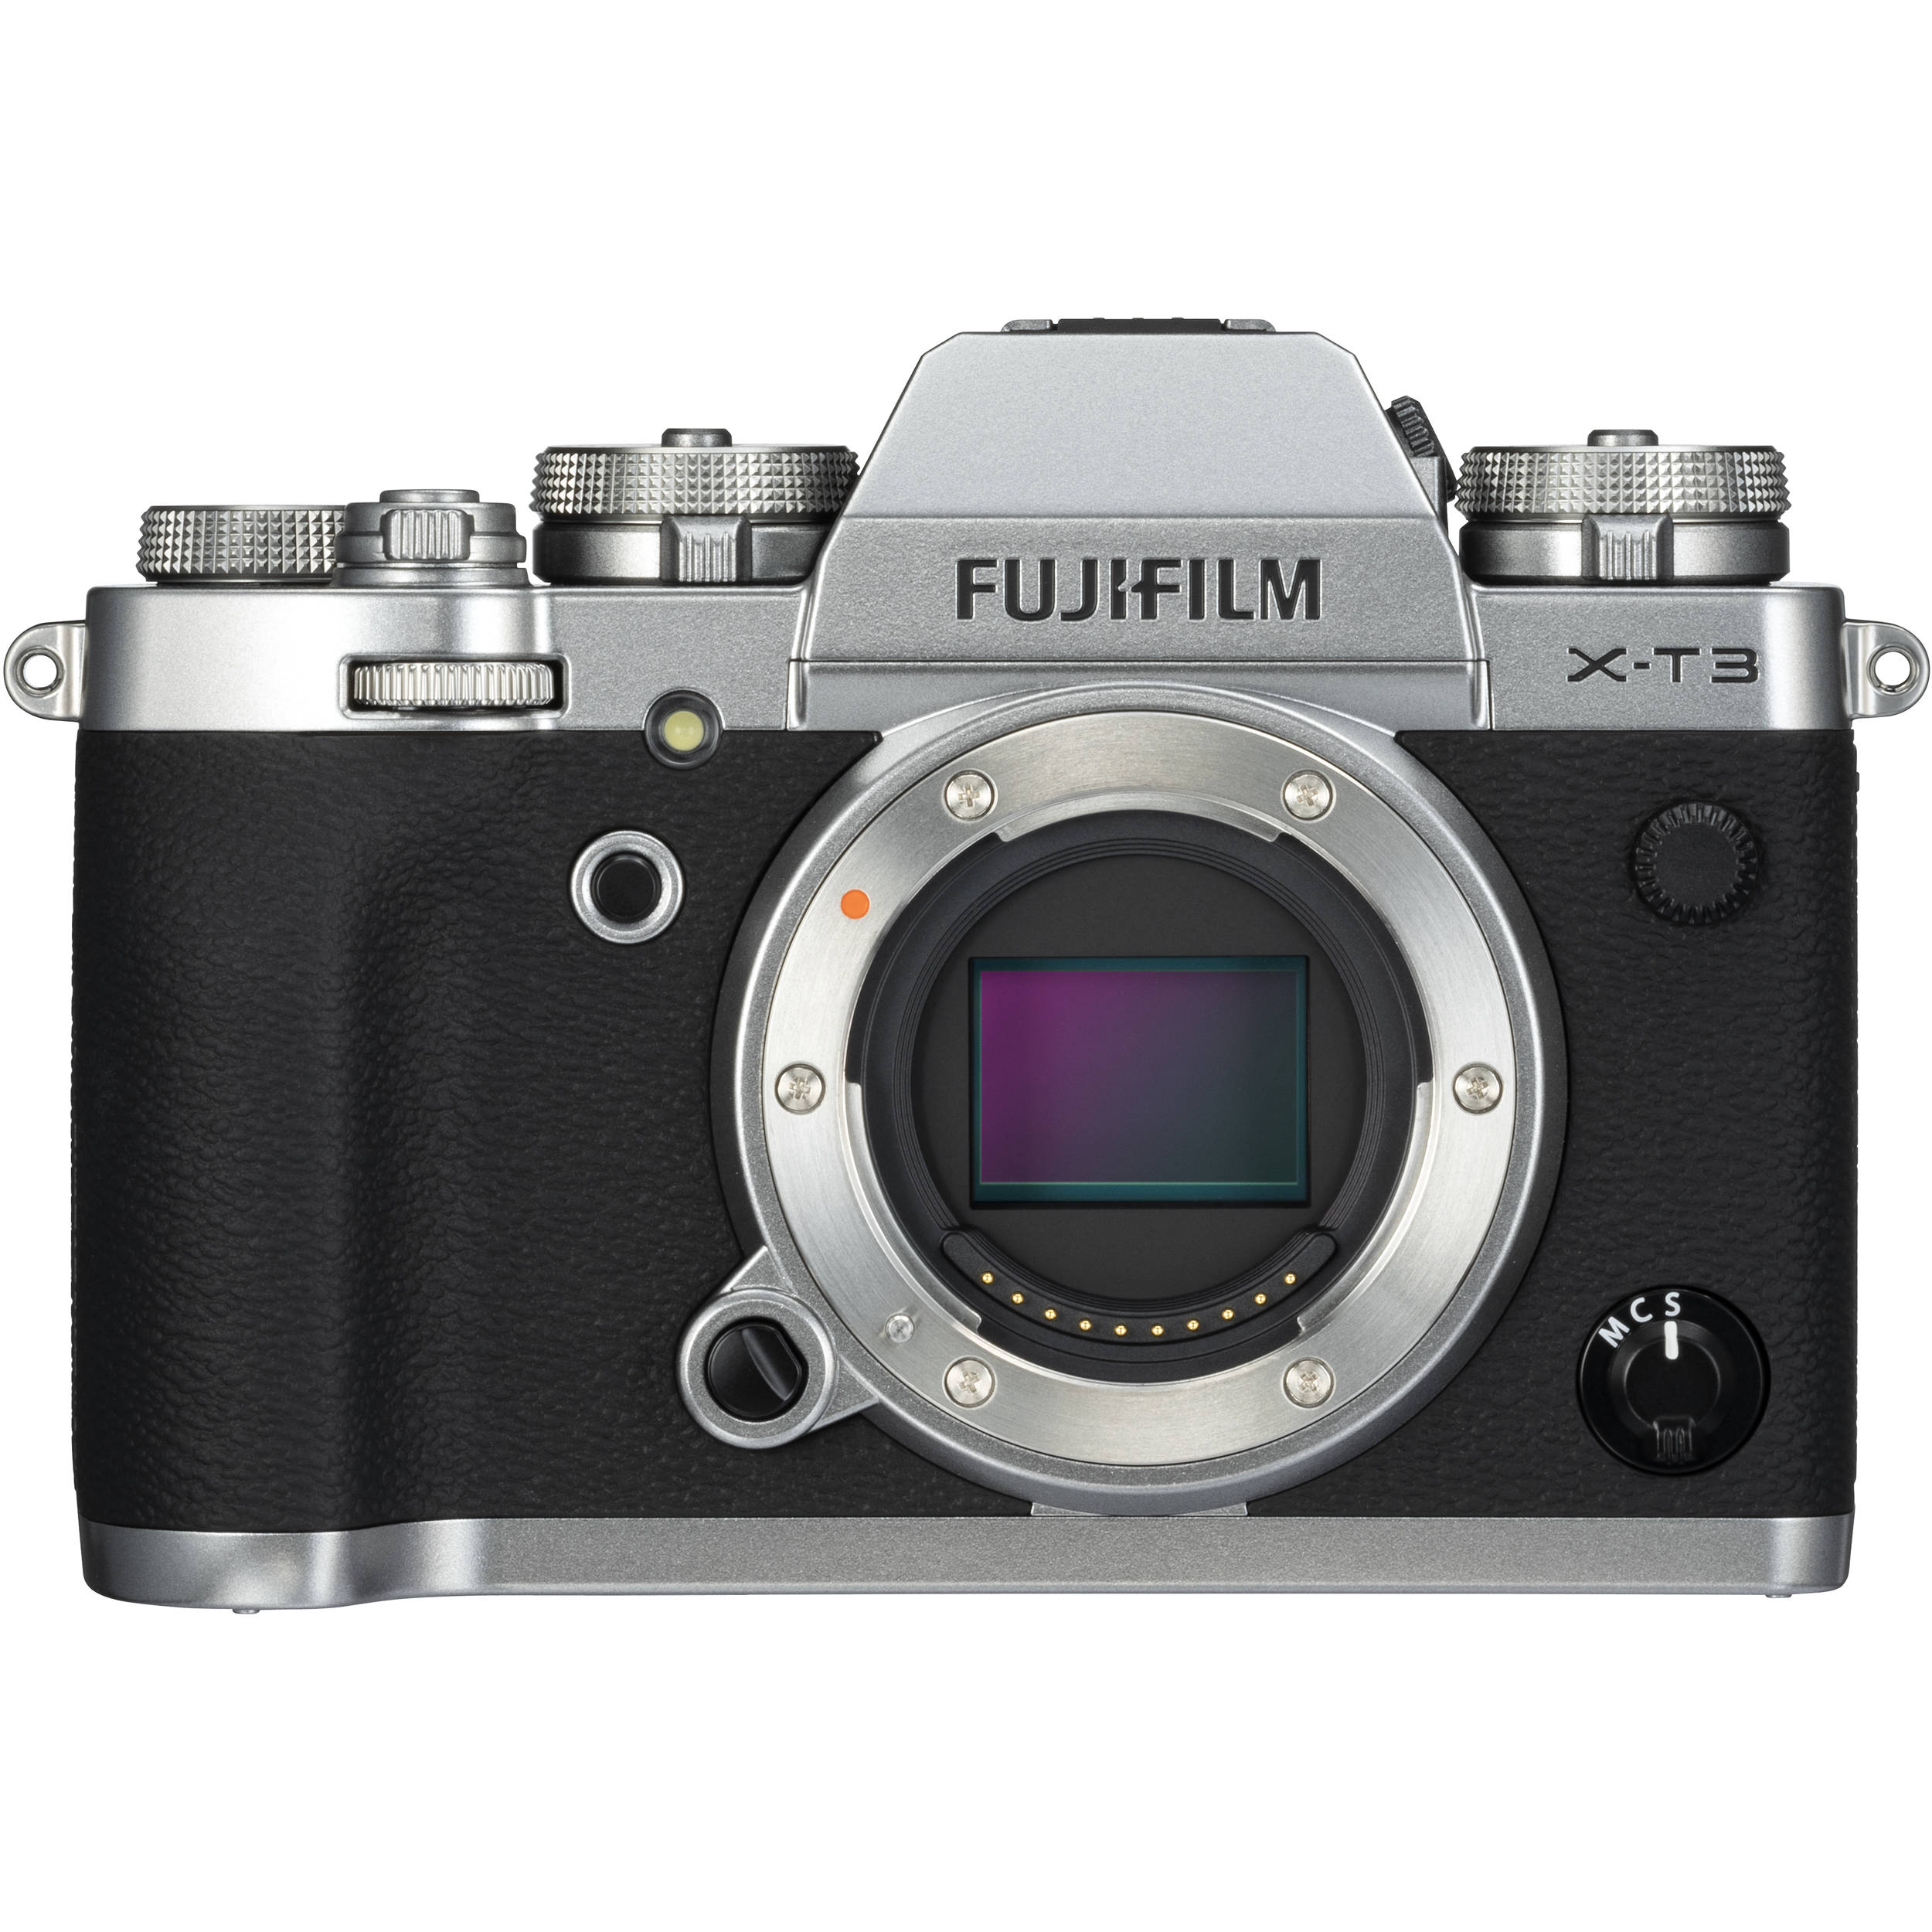 Hasil gambar untuk Fujifilm X-T3.